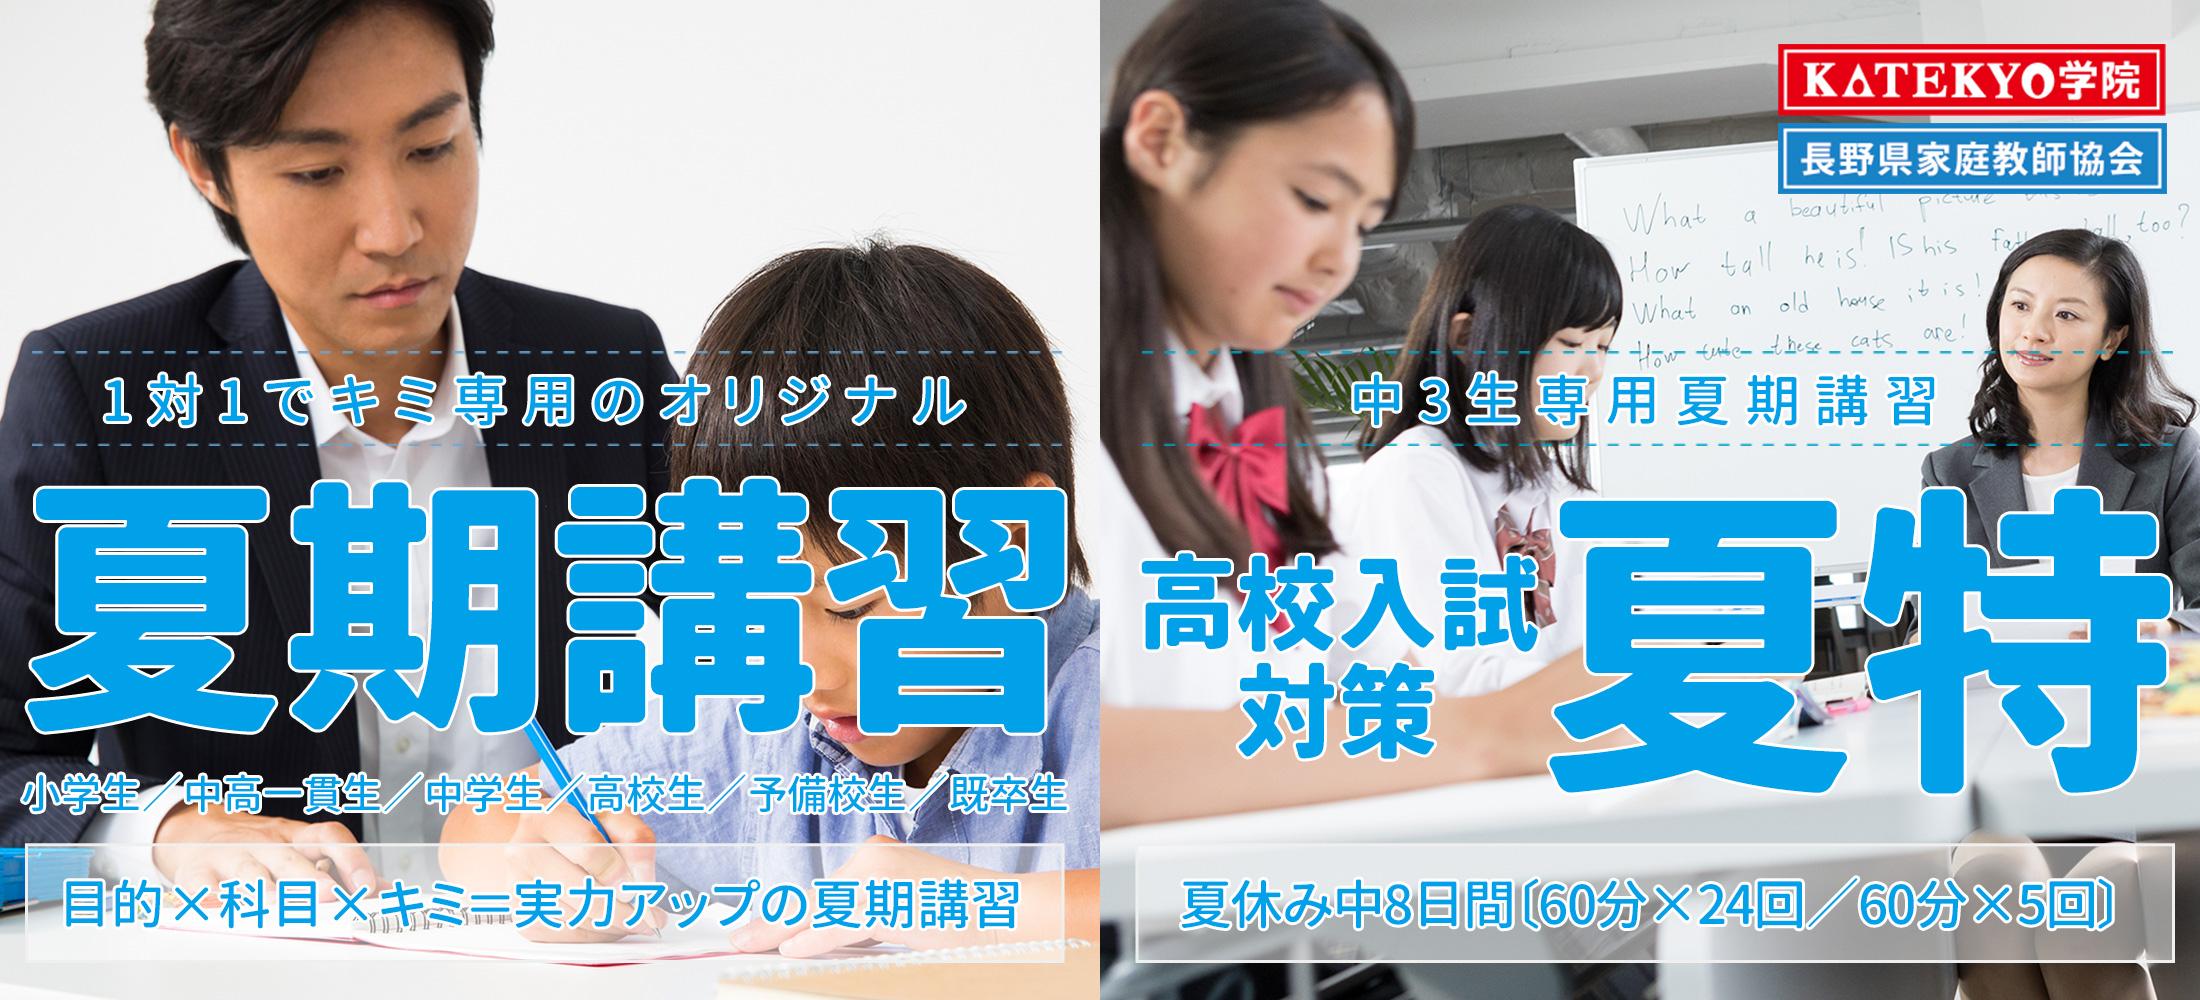 KATEKYOの夏期講習